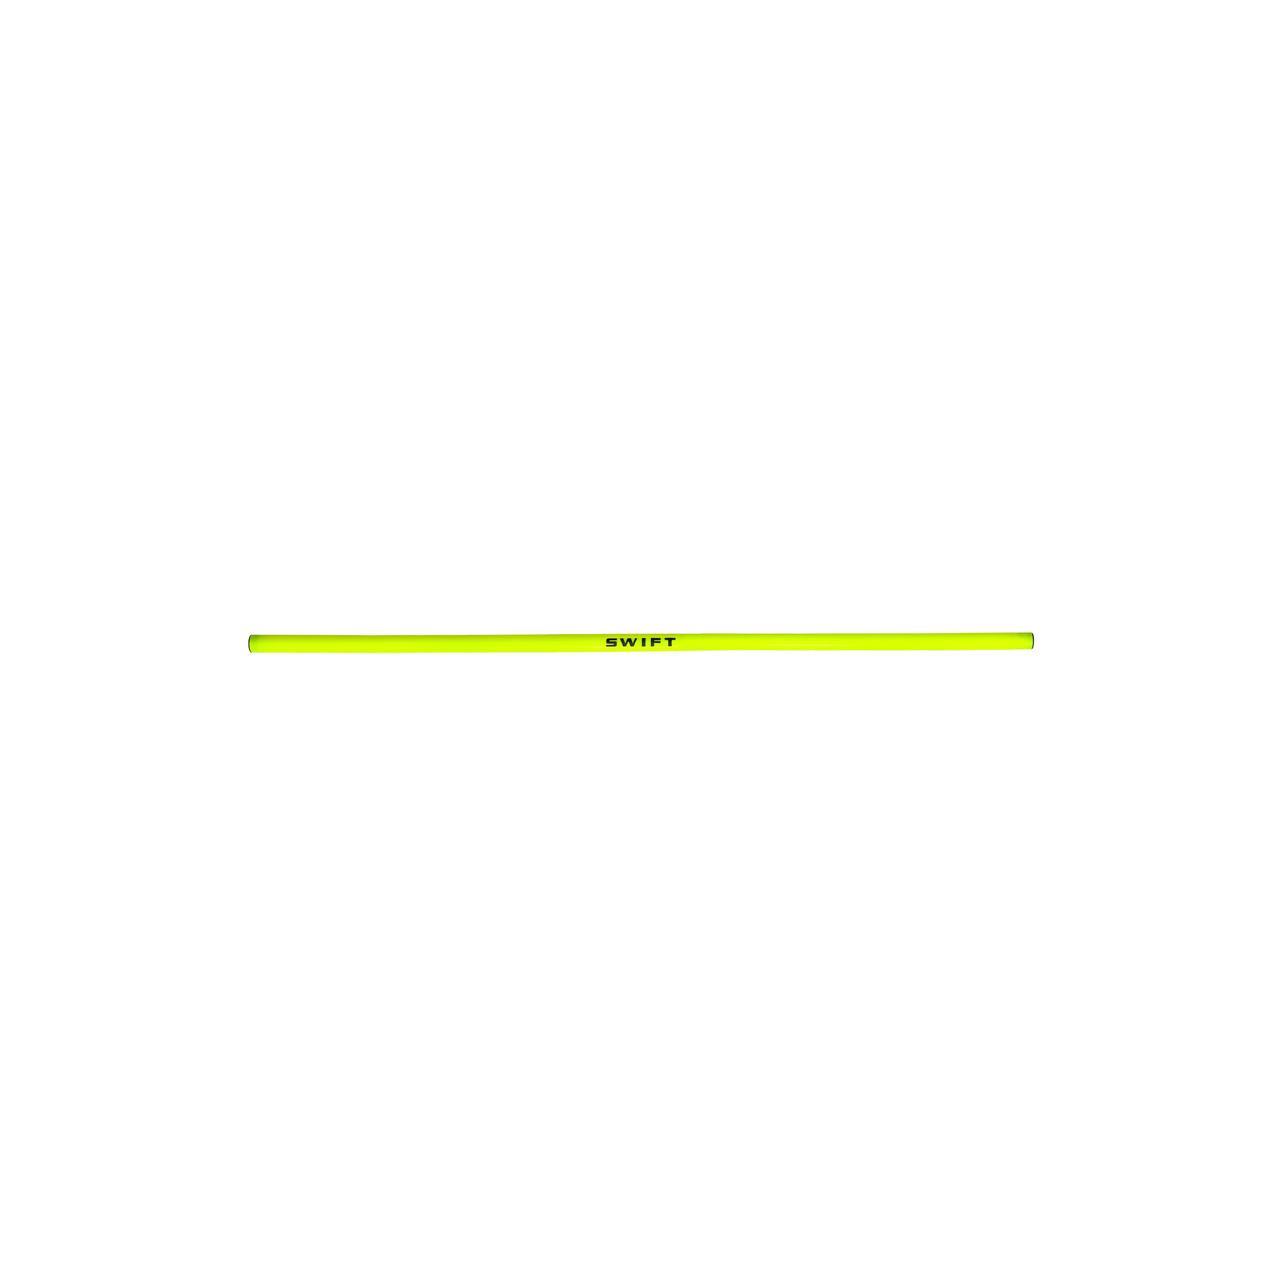 Палка гимнастическая SWIFT Training Pole d=25 мм, 160 см, желтый